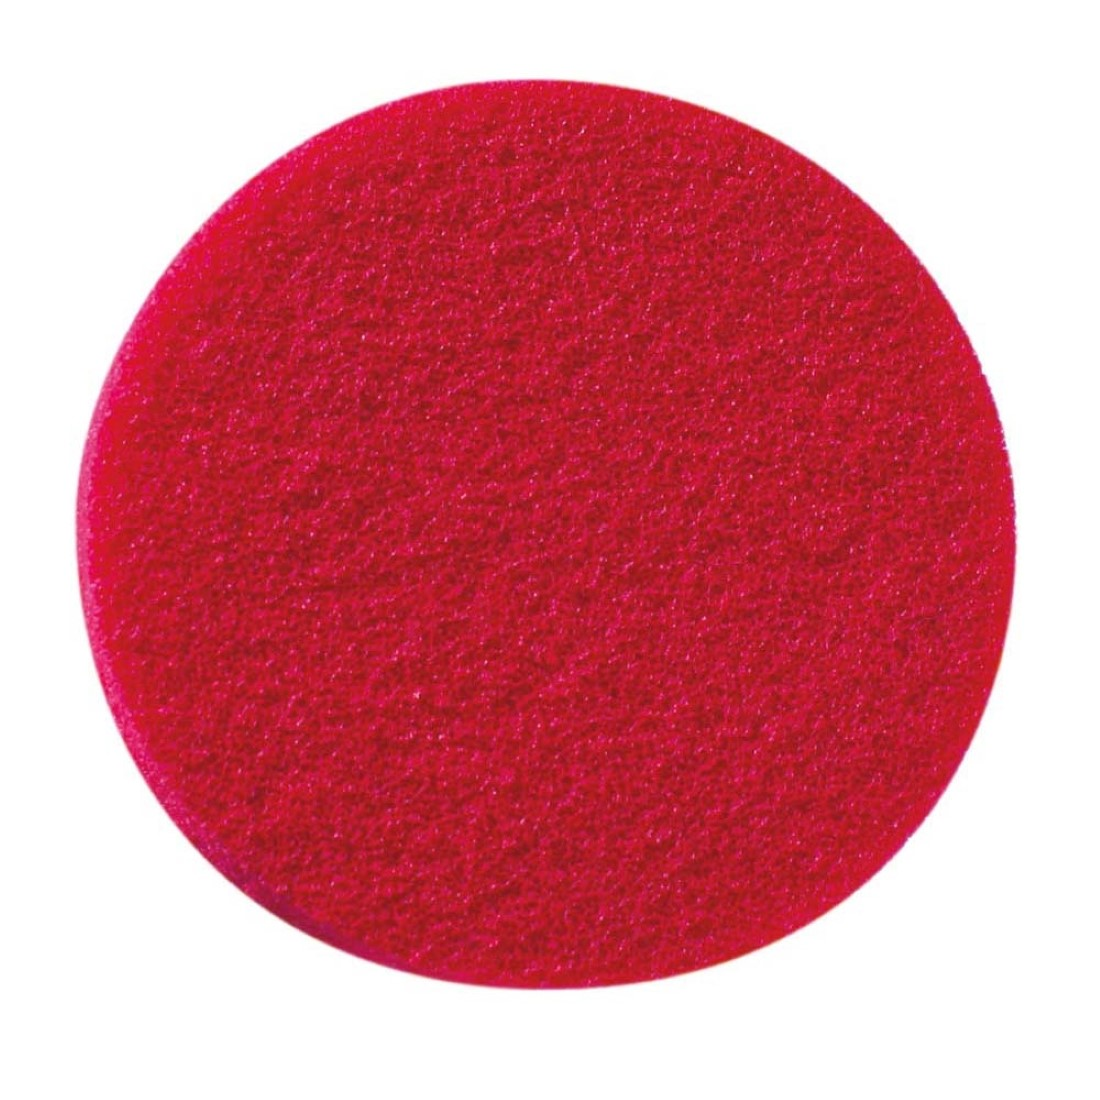 Esponja Esfoliante cód.558 - Belliz